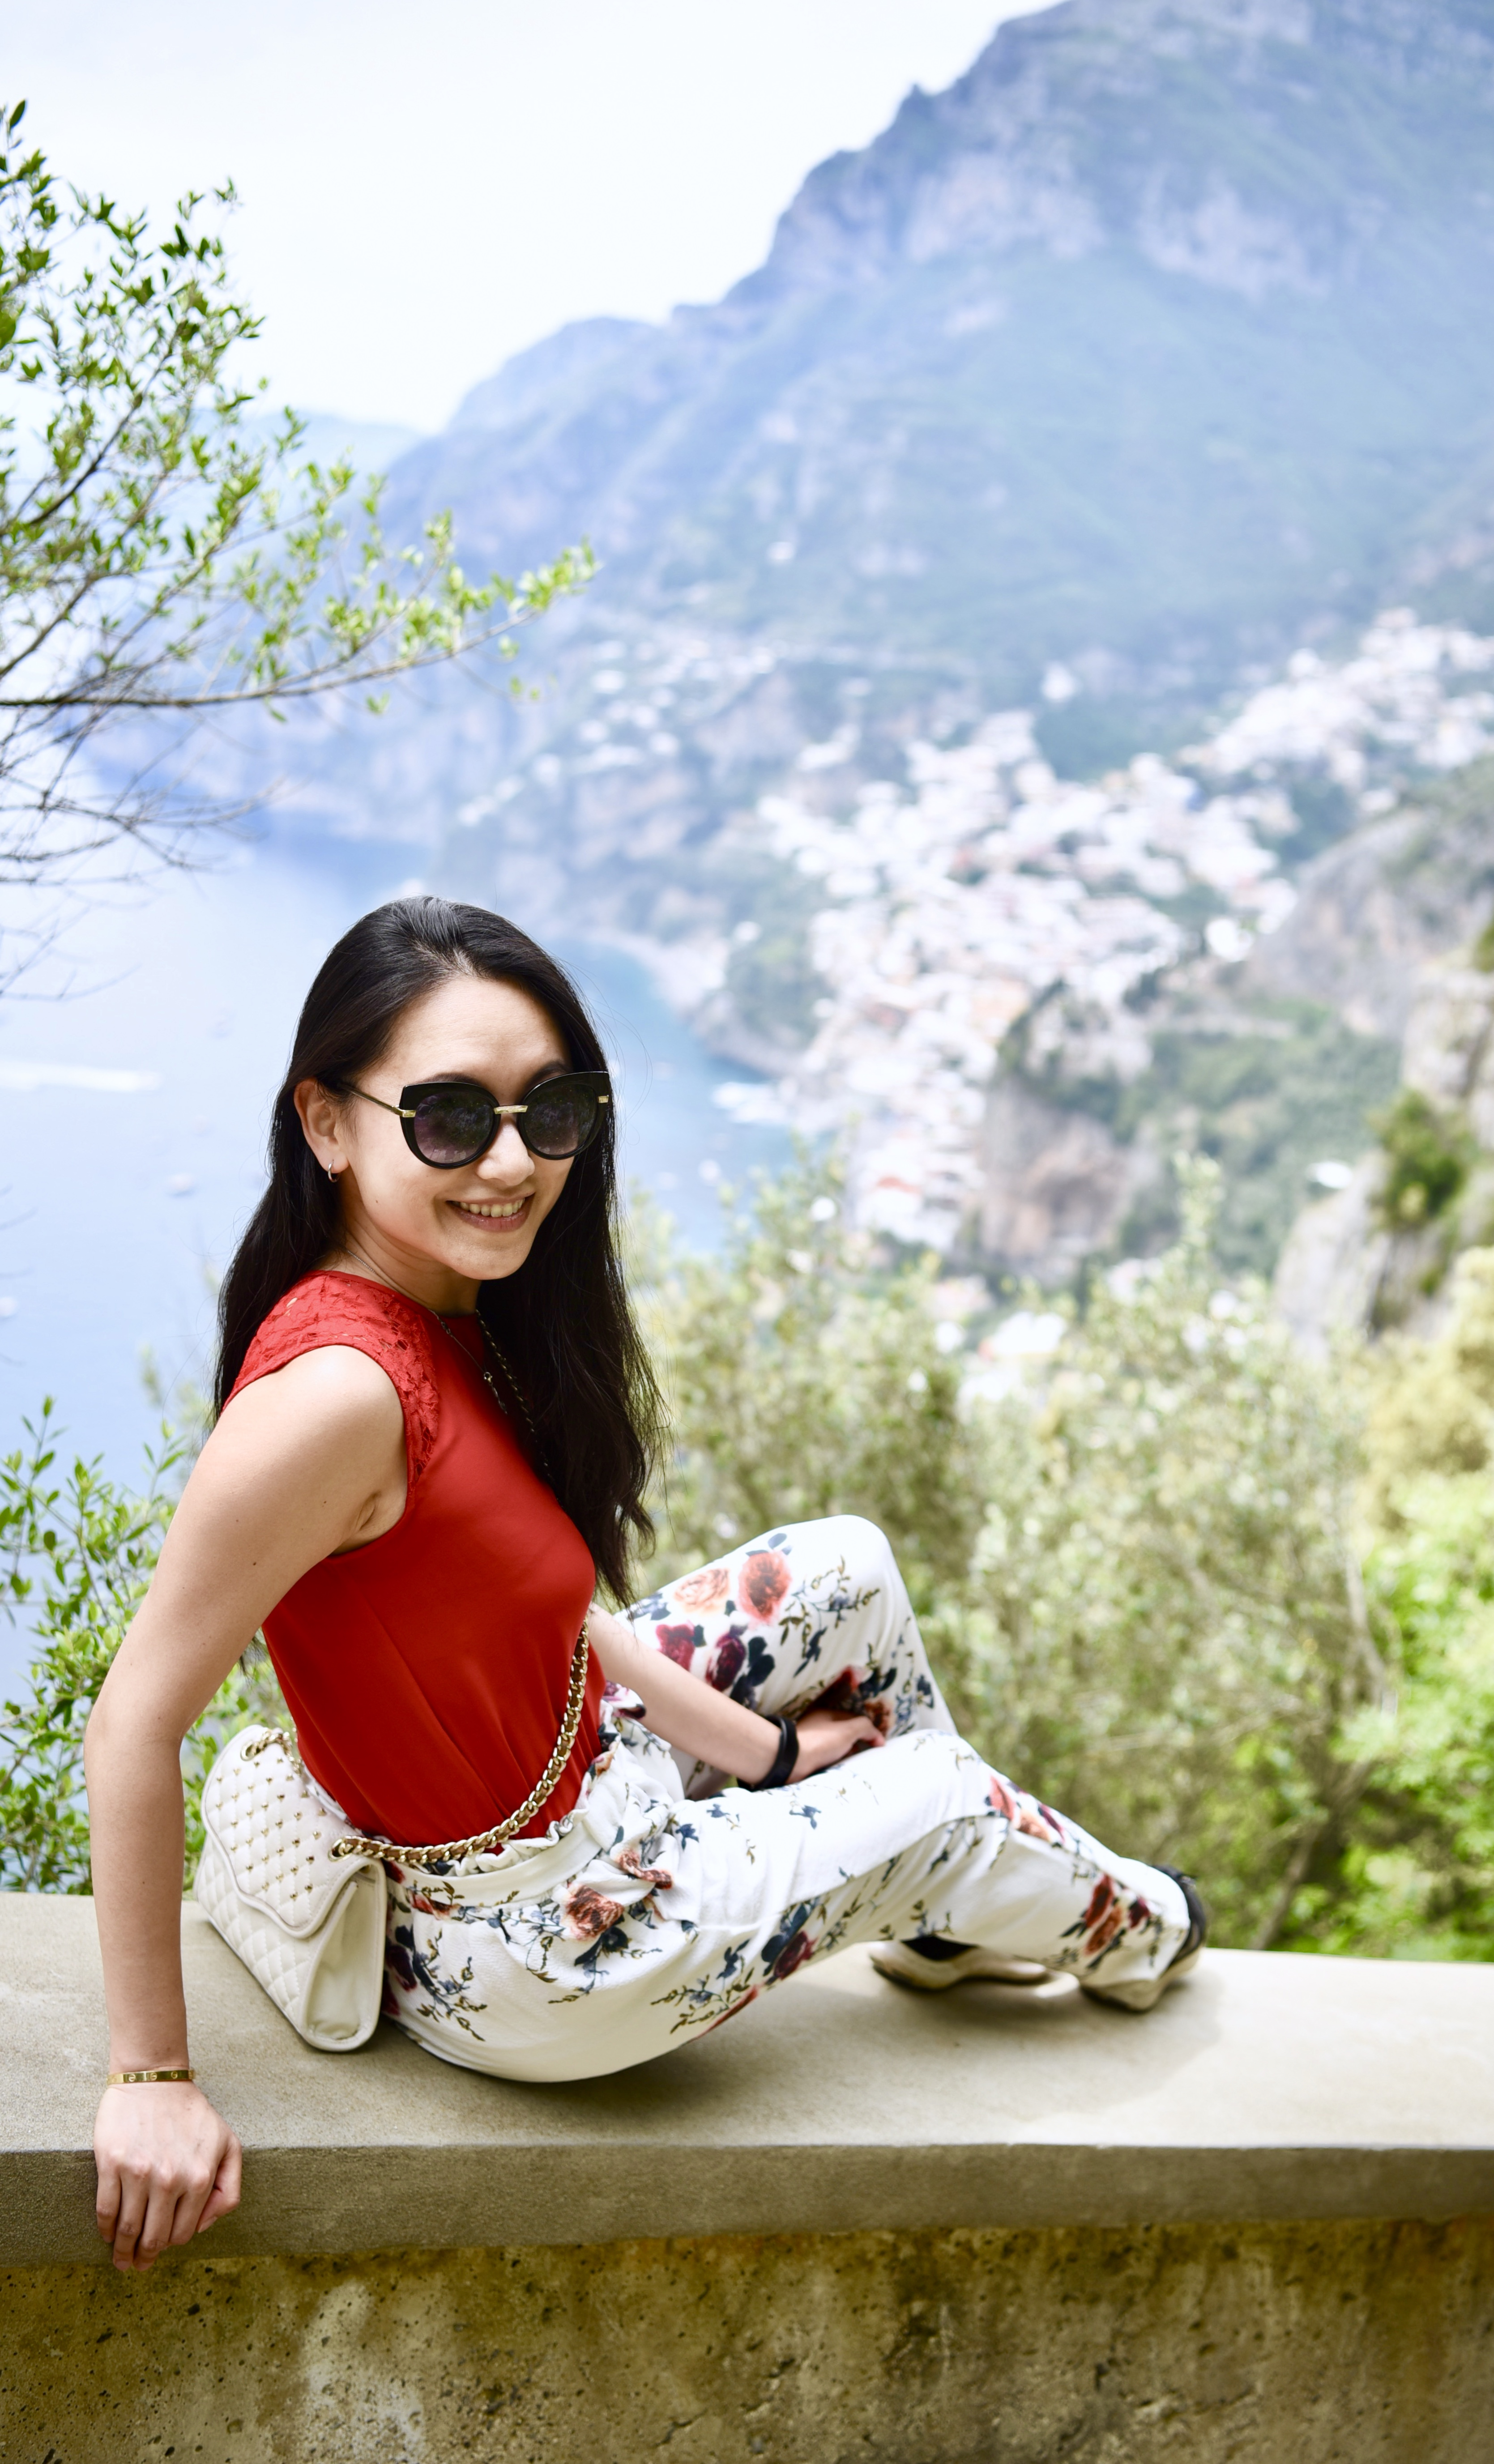 Sentiero Degli Dei Hike Flower Pants Positano Town Amalfi Coast DNXB dongnanxibei